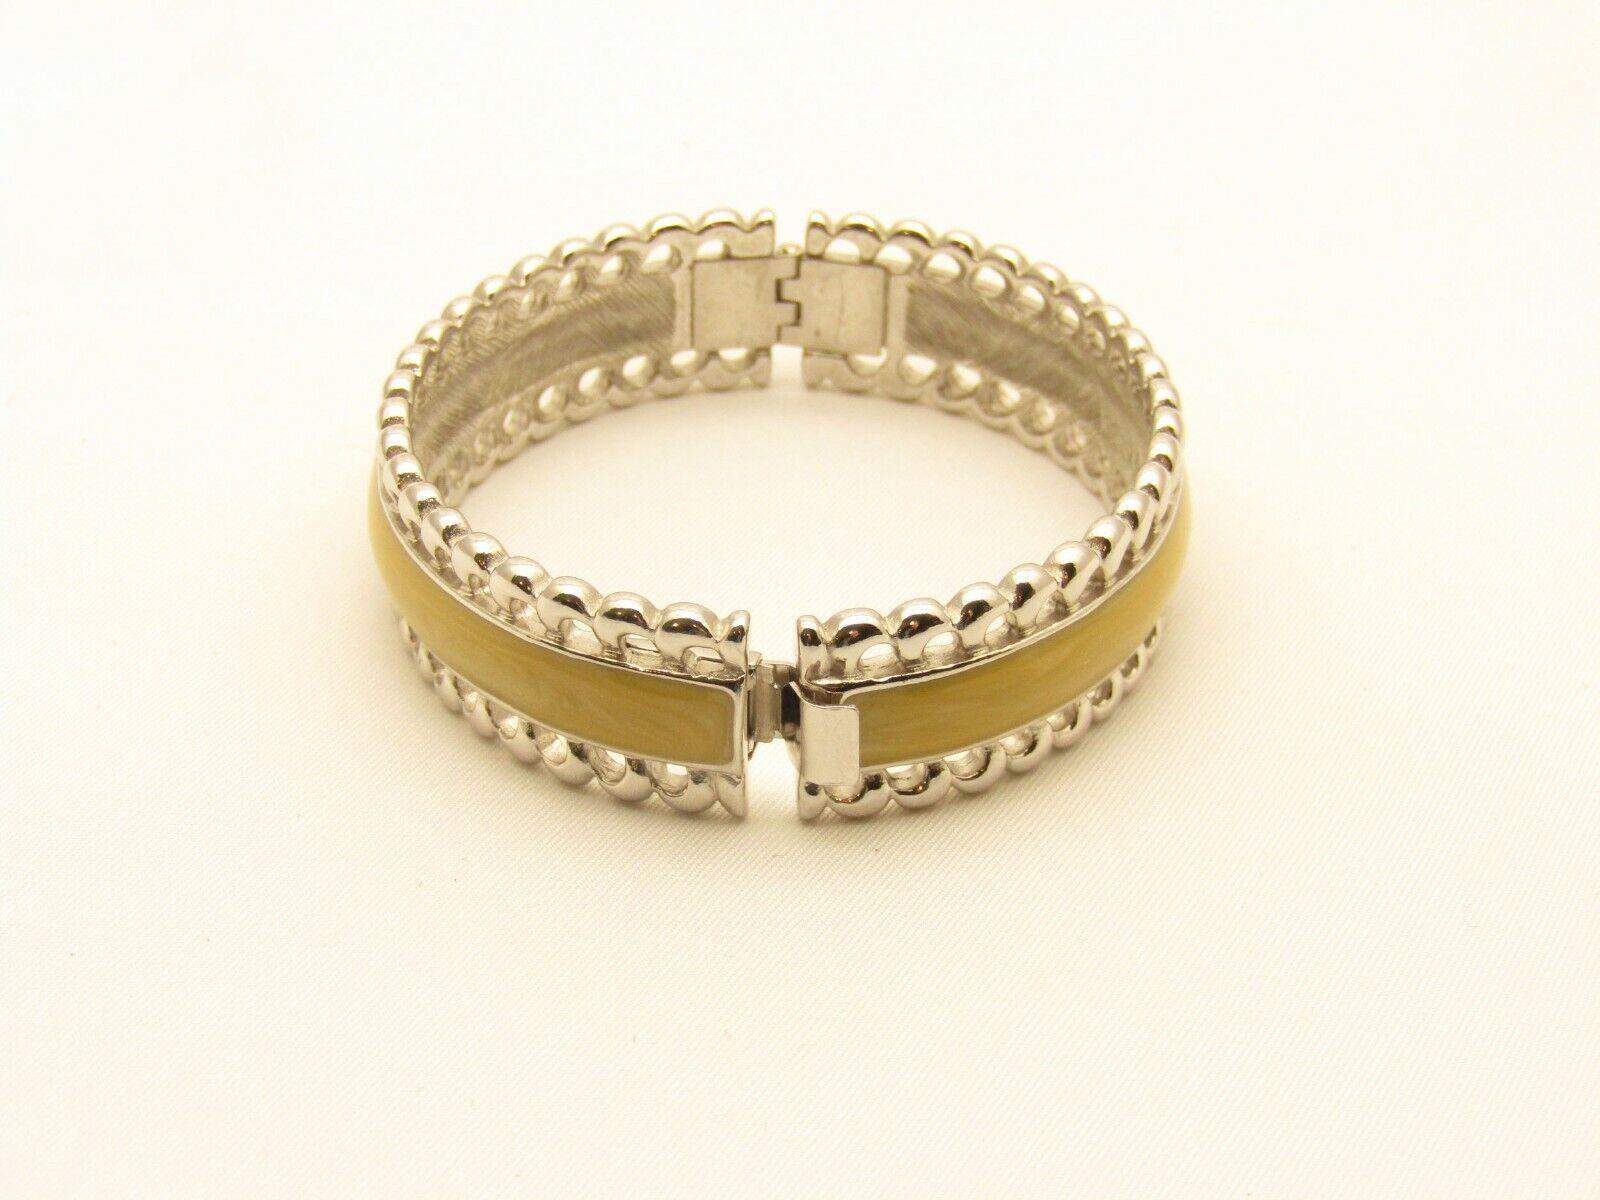 nos jewelry Sale estate with tag Unused Vintage signed Monet Hinged Bangle bracelet